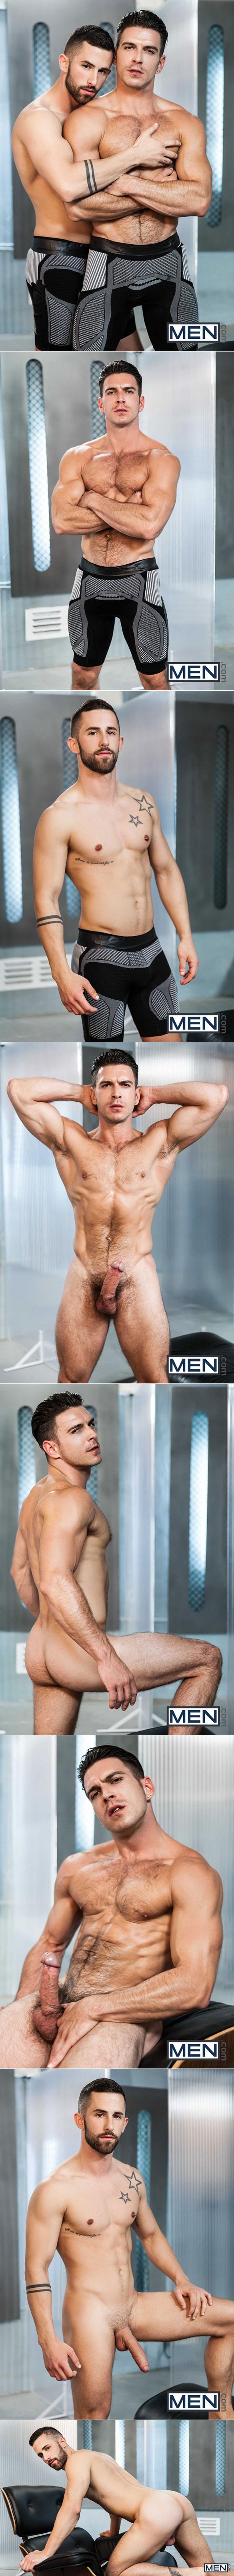 "Men.com: Paddy O'Brian fucks Sunny Colucci in ""Ex-Machina: A Gay XXX Parody, Part 2"""